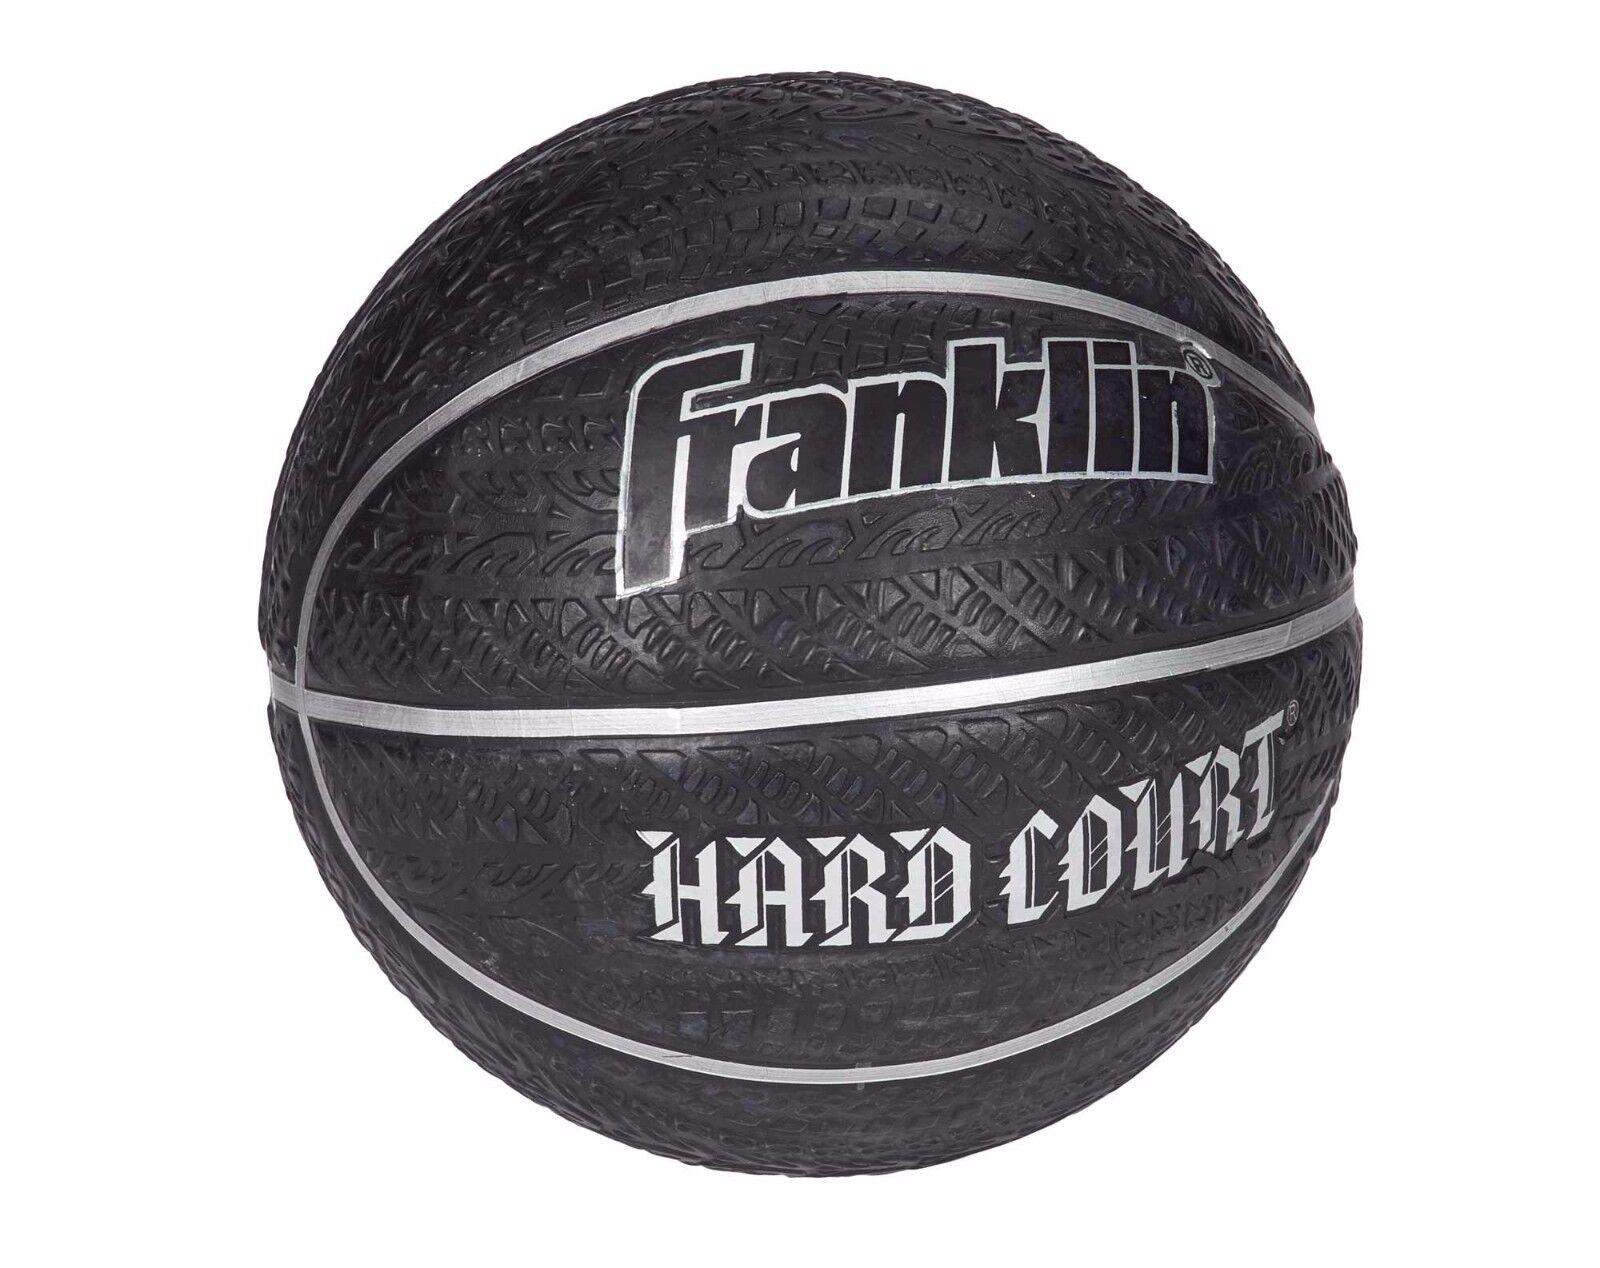 Franklin Hard Basket-Ball, Court ® Basket-Ball, Hard Official Size-Basket-ball e3e38c